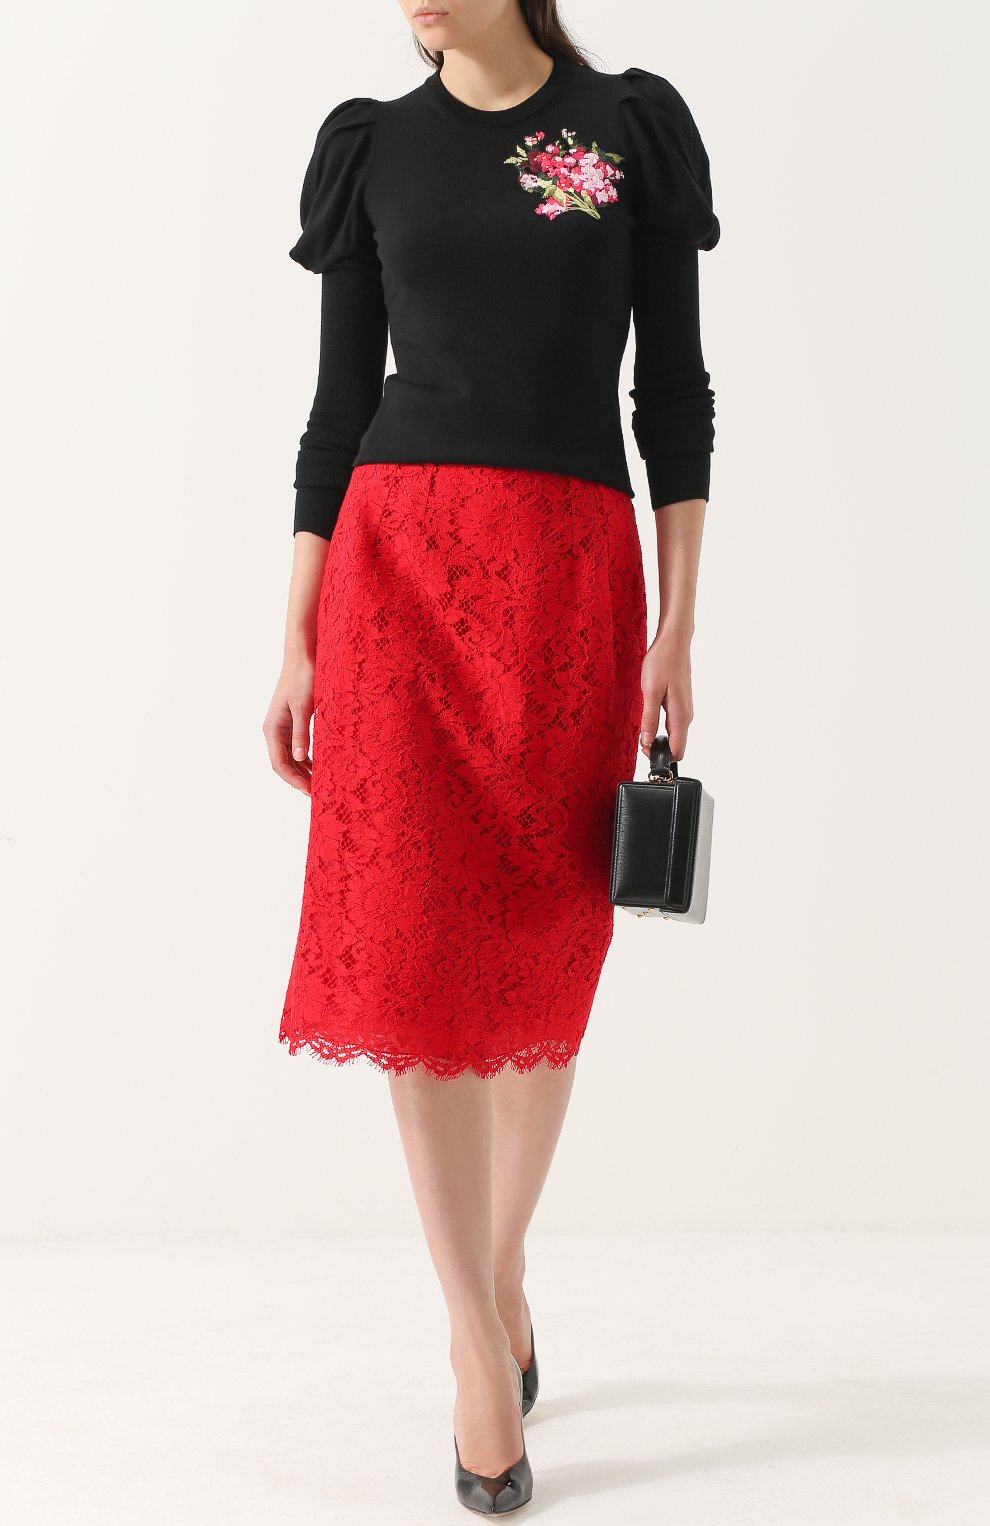 Кружевная юбка-карандаш с разрезом Dolce & Gabbana красная | Фото №2